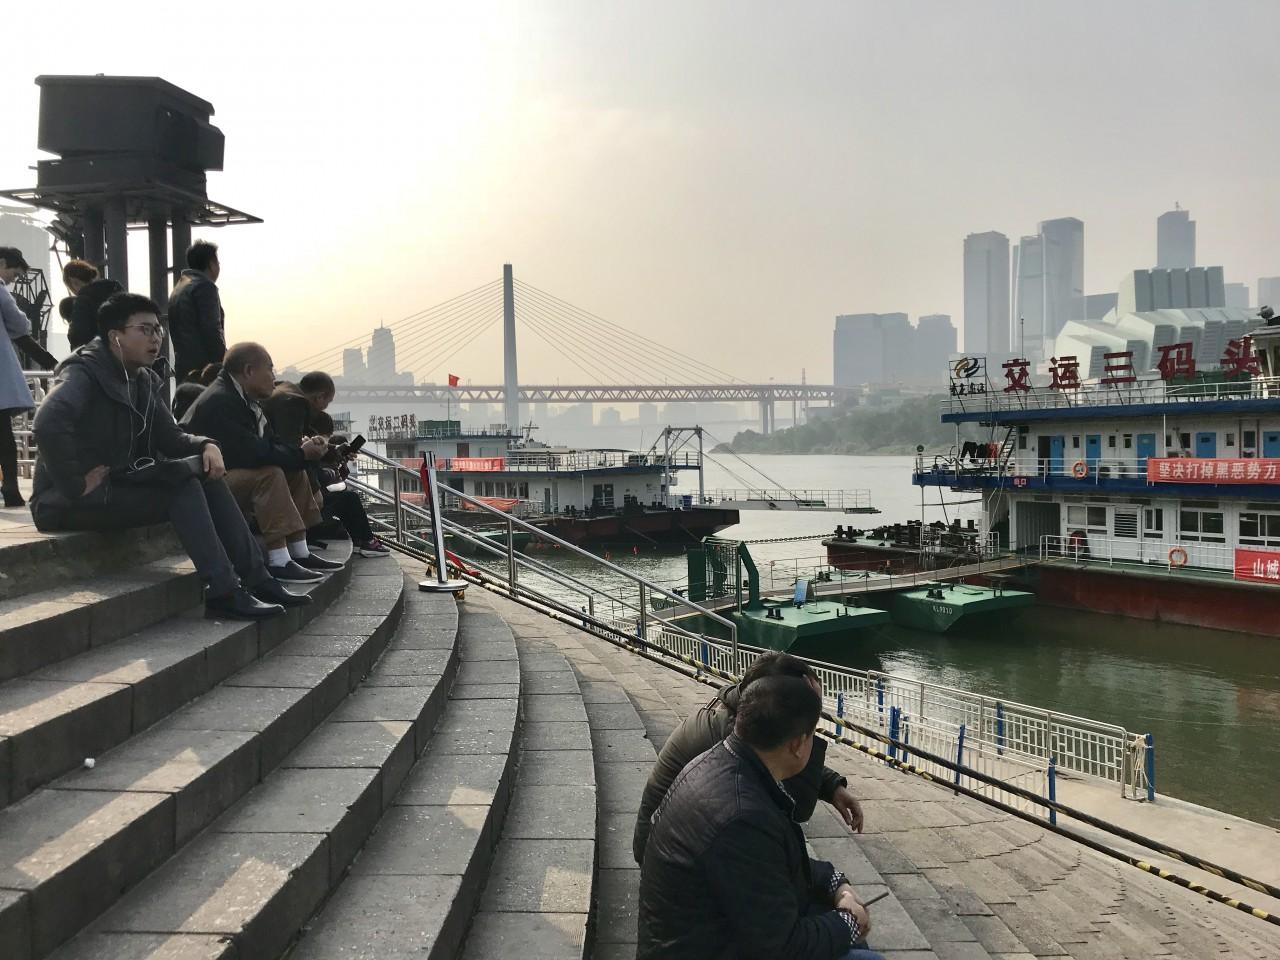 Chongqing's cultural landmark, Chaotianmen Dock. (SPH)